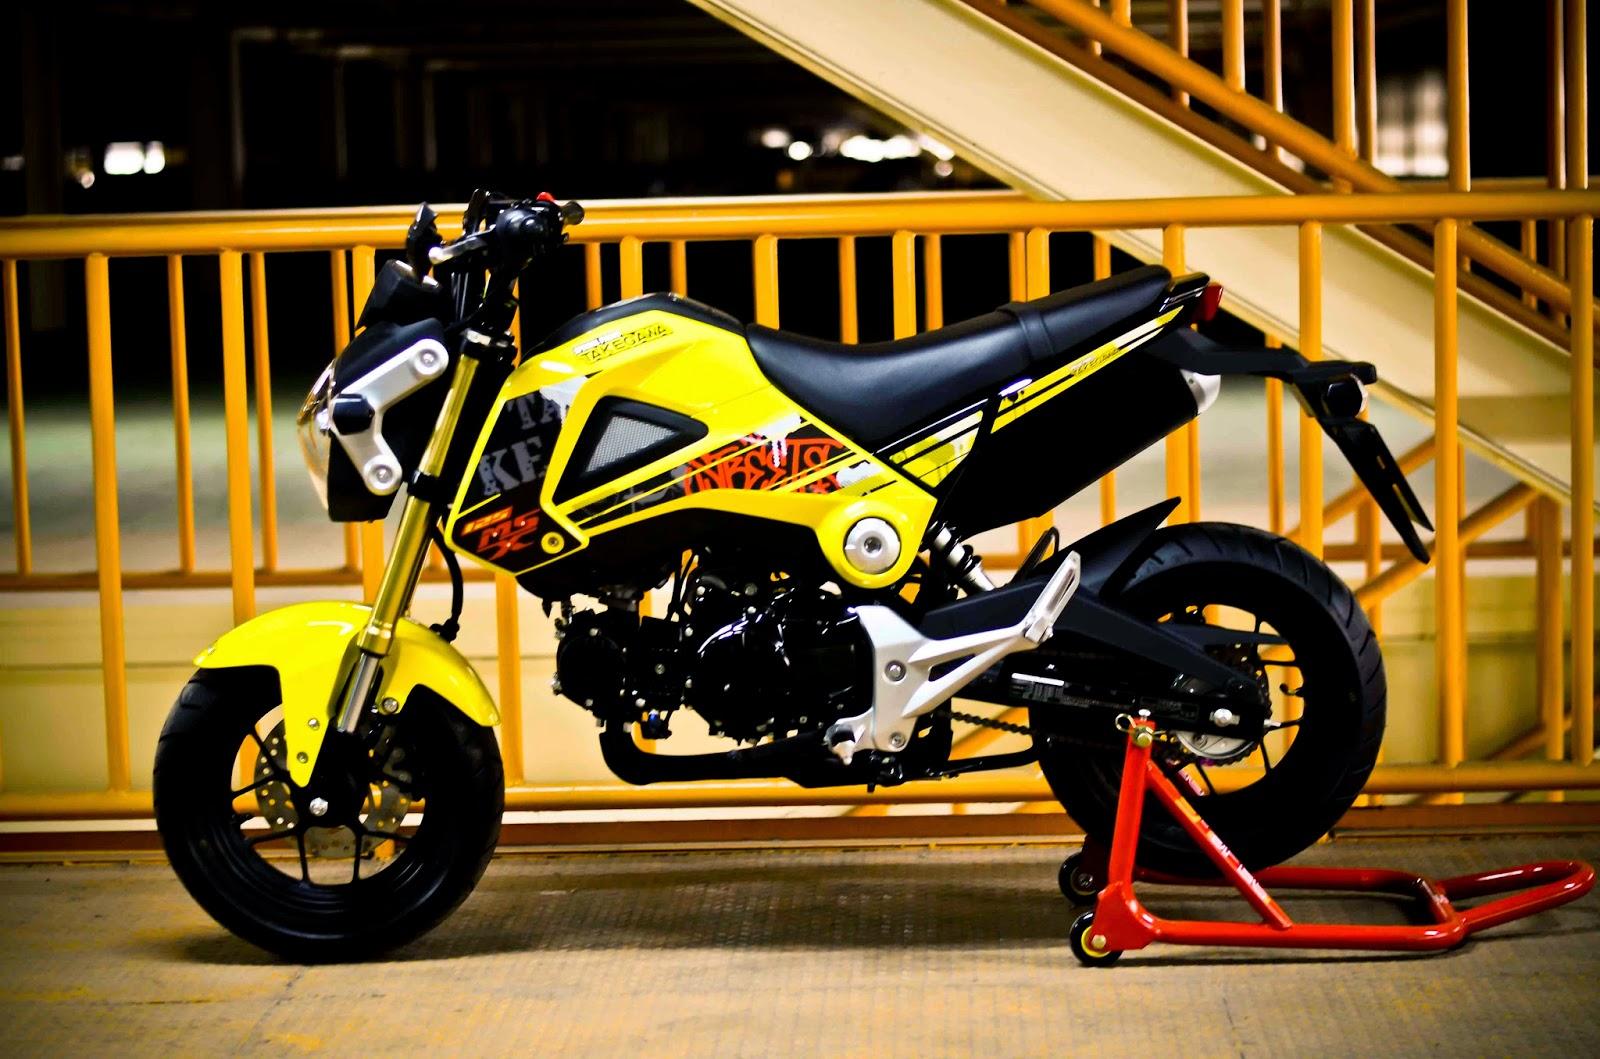 Honda MSX 125 Secret Weapon